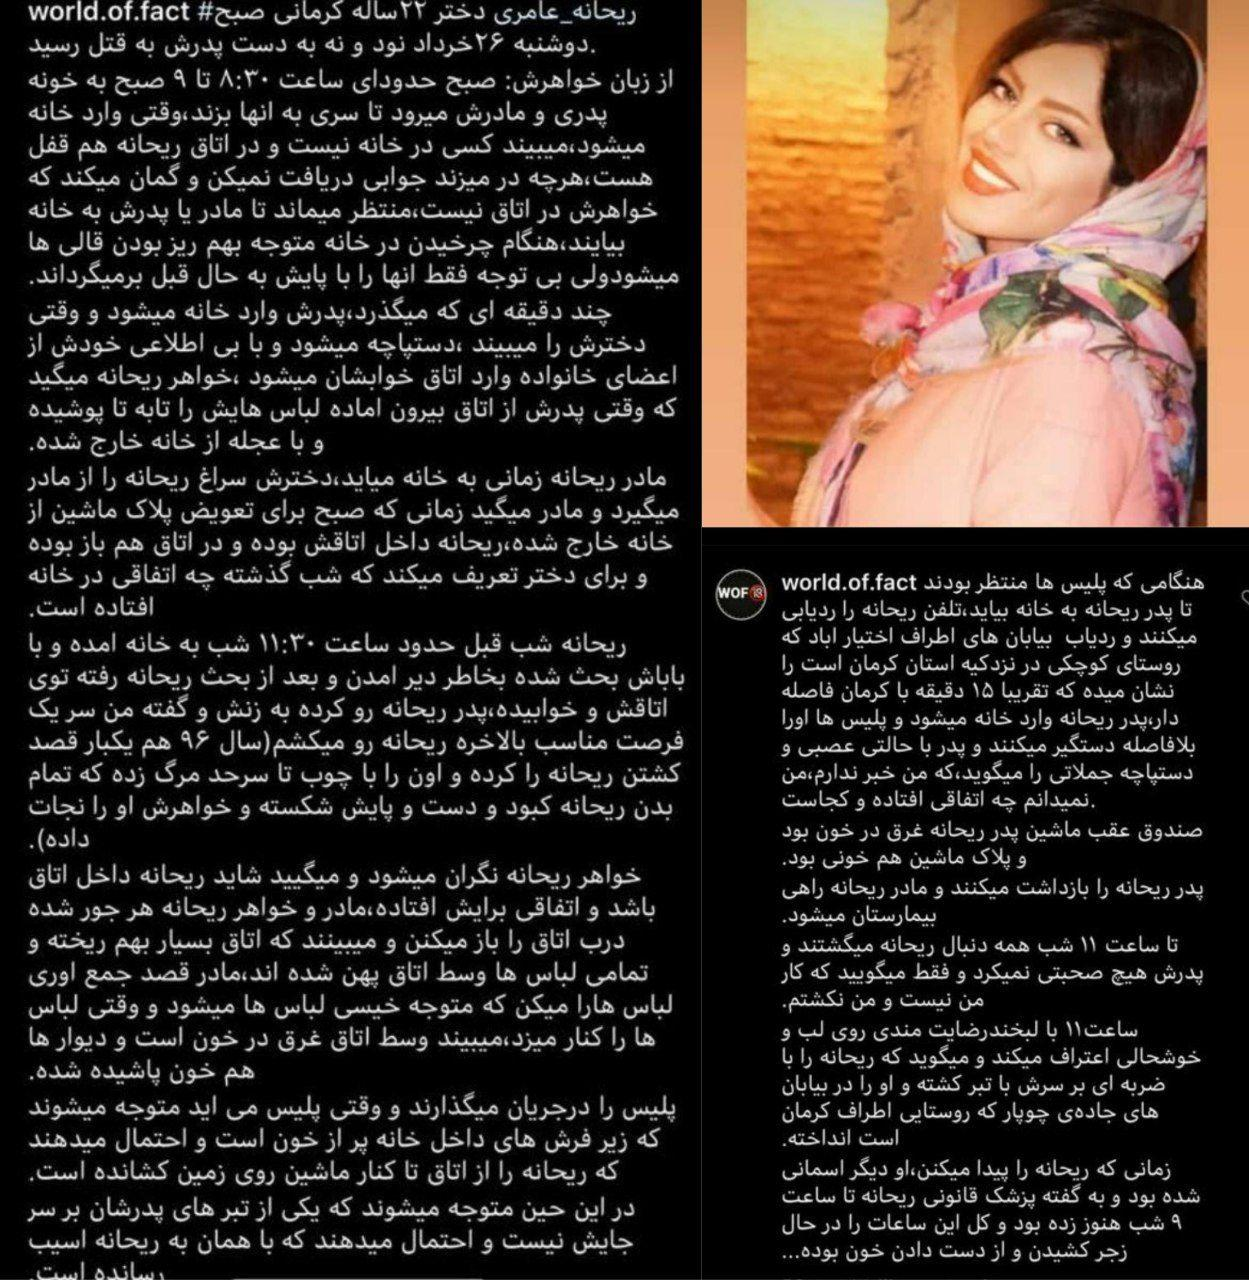 photo_2020-06-17_00-18-09.jpg